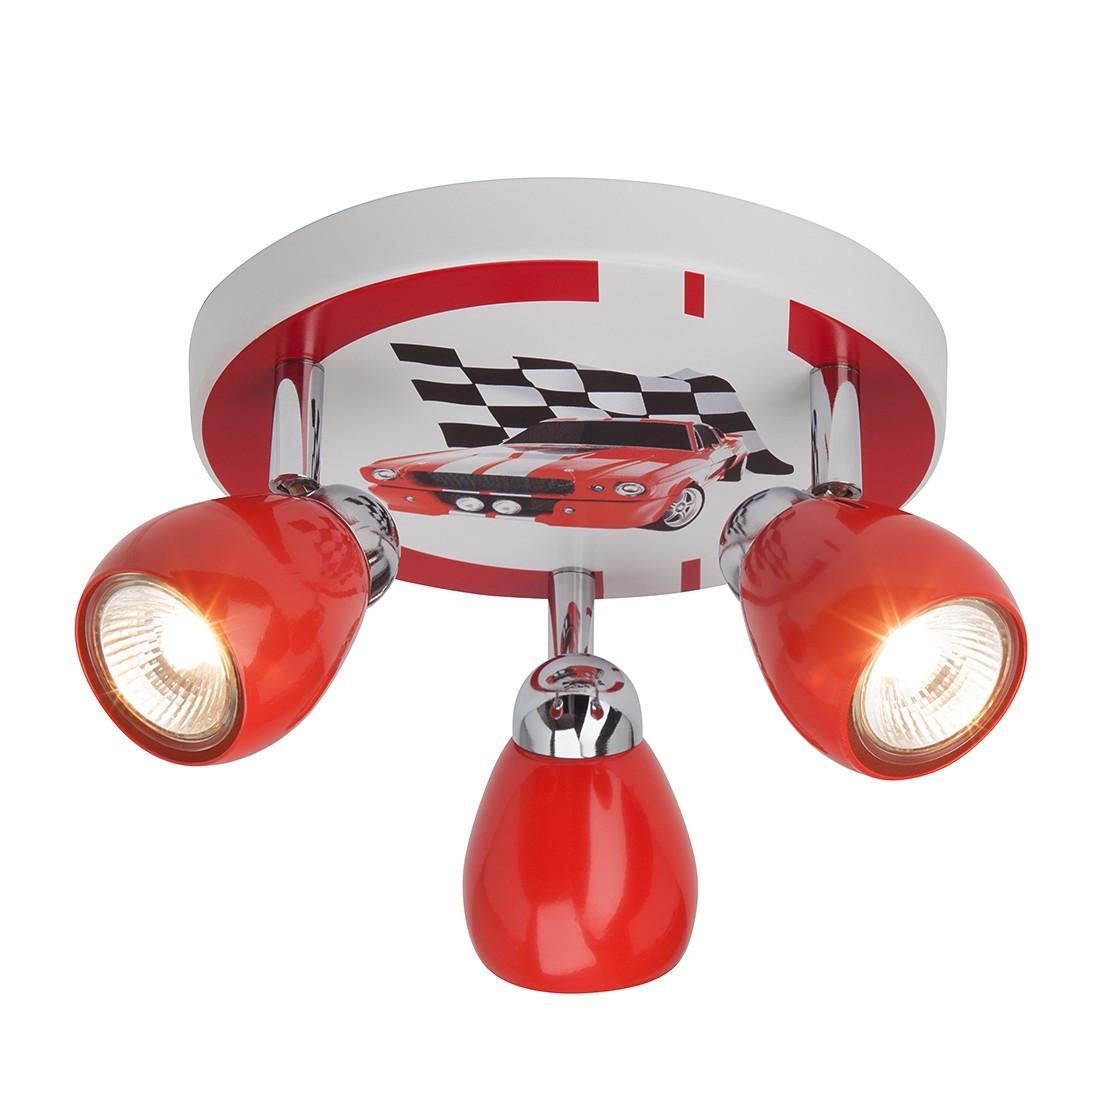 EEK A++, Deckenleuchte Racing - Metall - Multicolor - 3-flammig, Brilliant